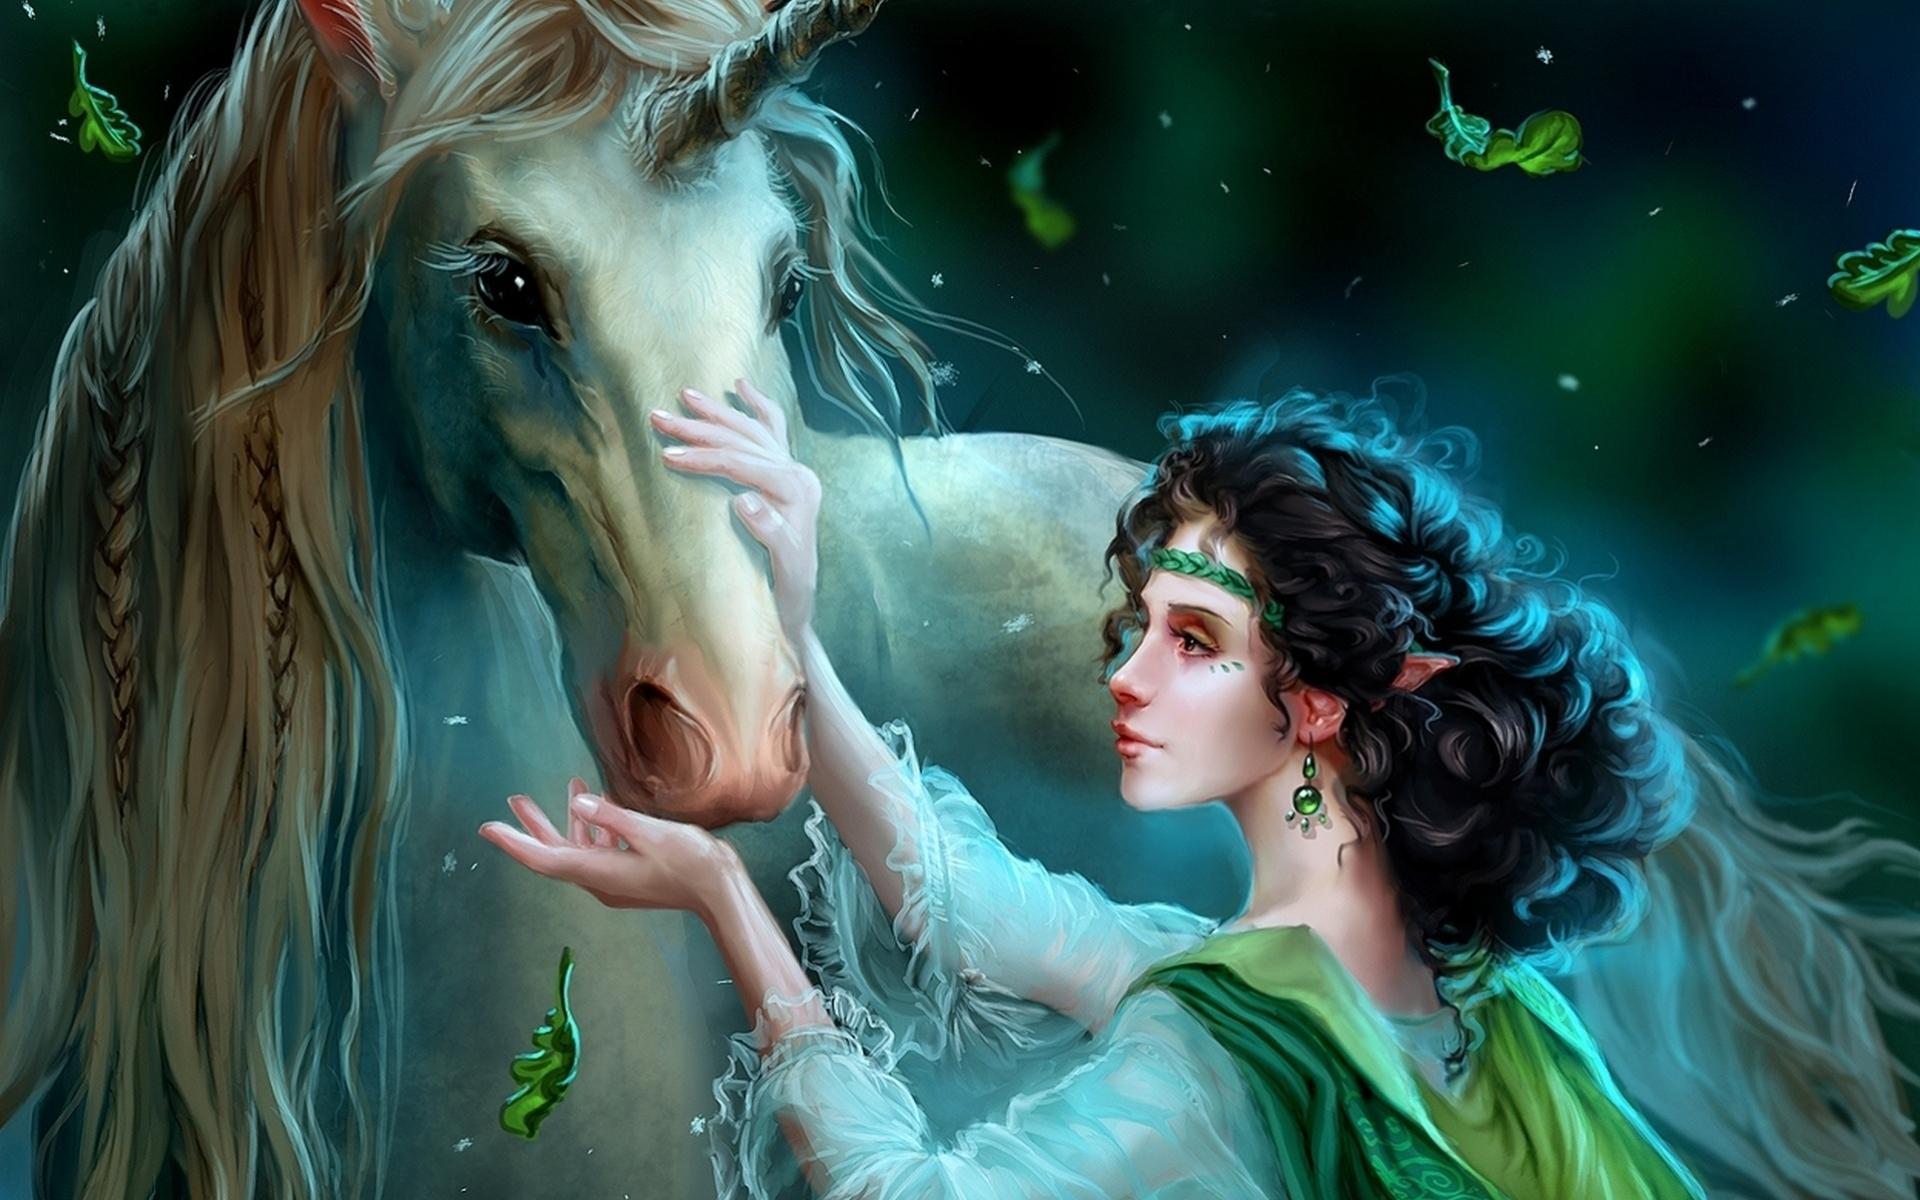 1920x1200_uildrim-skazka-art-devushka-wild-dreamer-elf